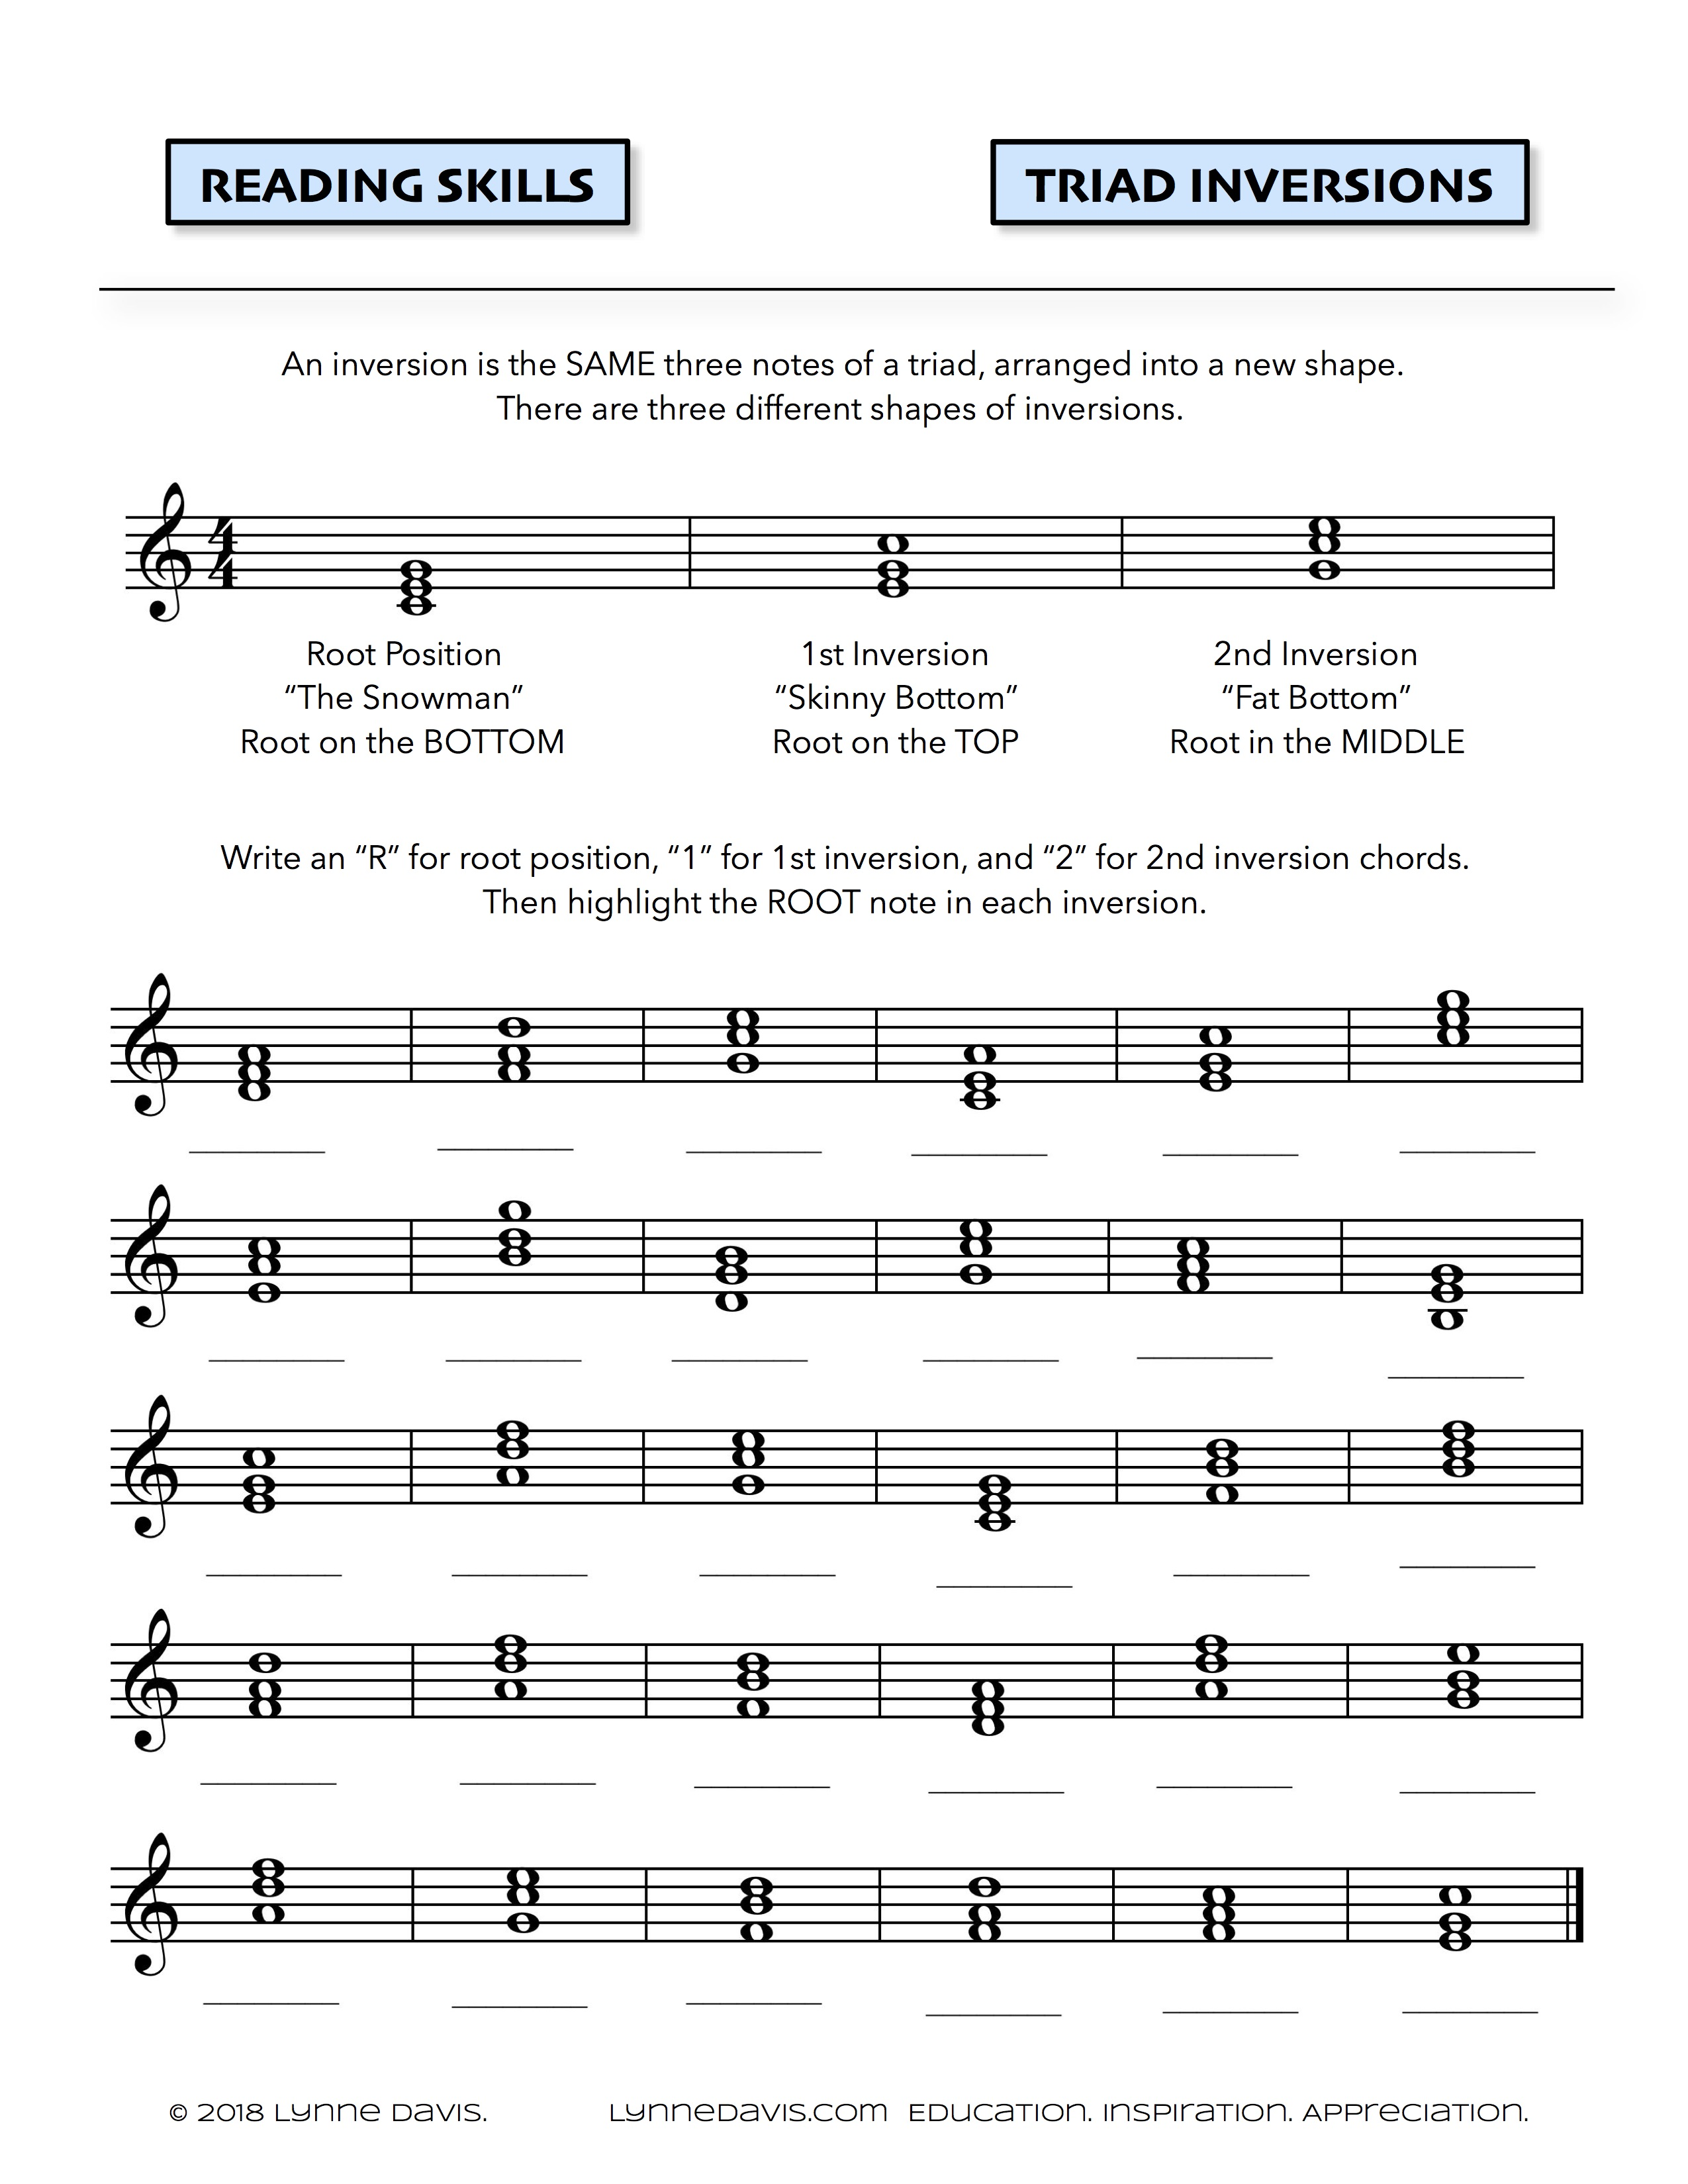 Inversions Worksheet | Lynne Davis Music